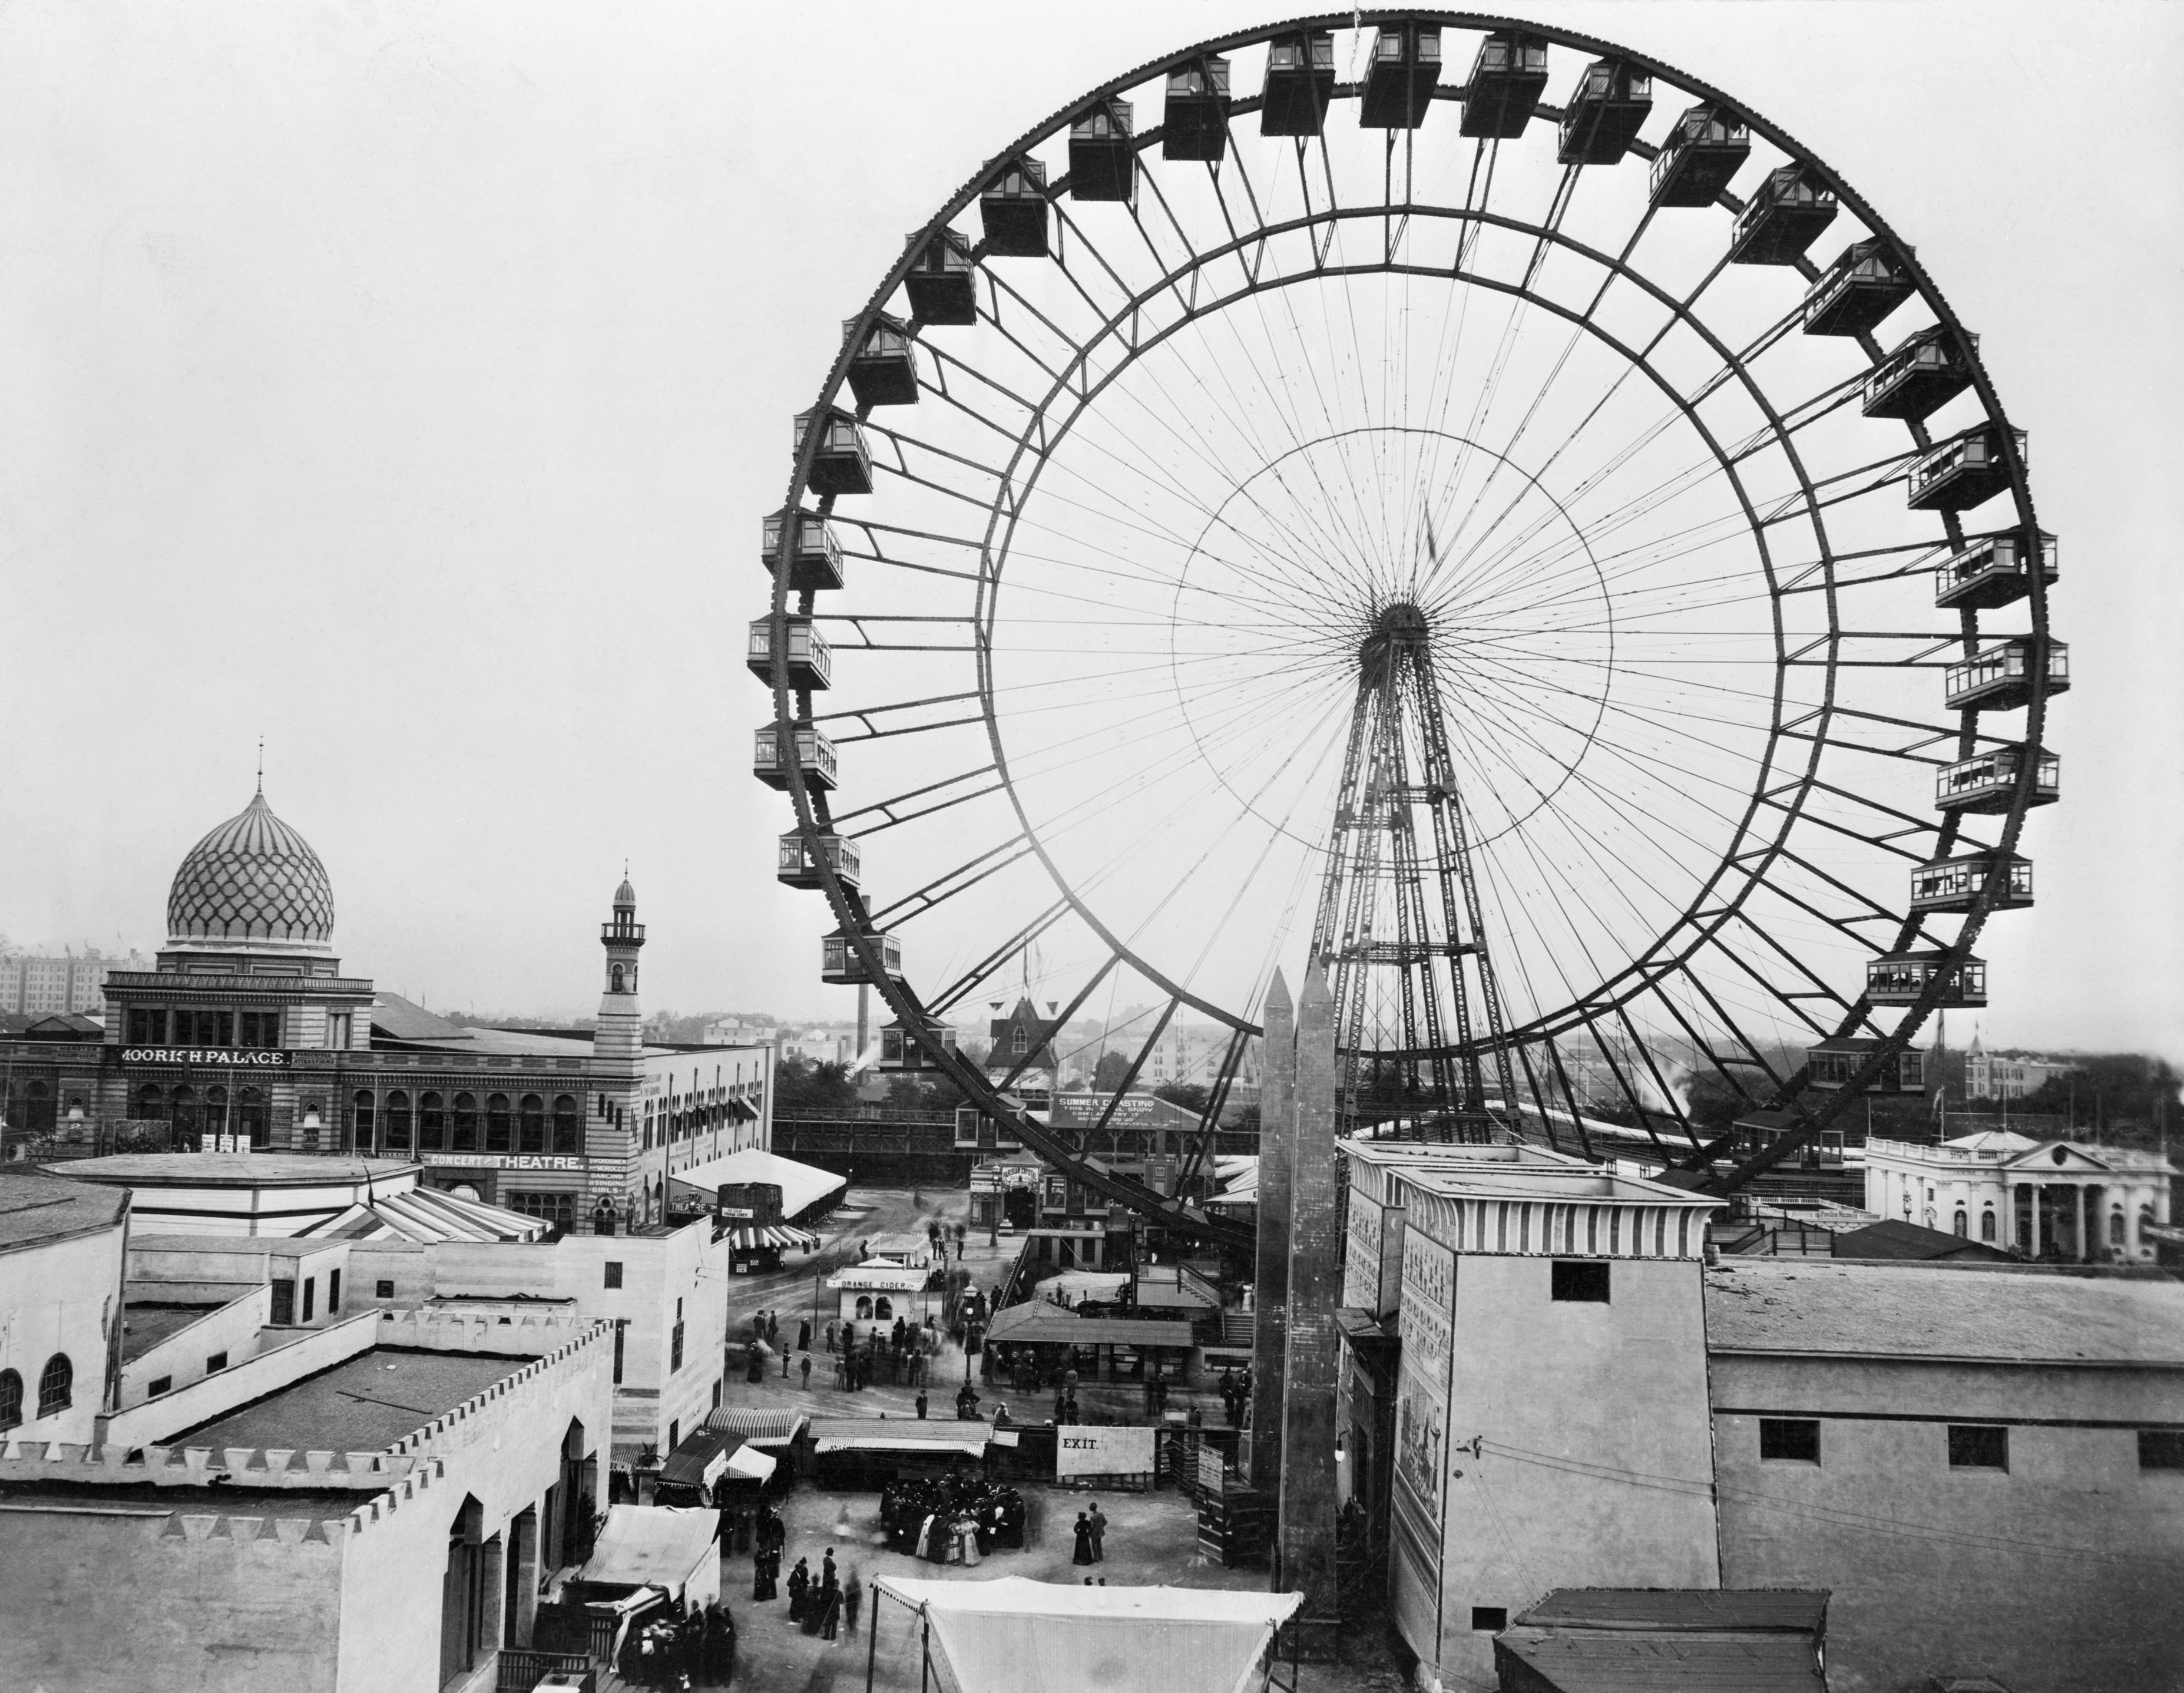 Chicago S Best Interior Designer: Chicago's Popular 1893 World's Columbian Exposition